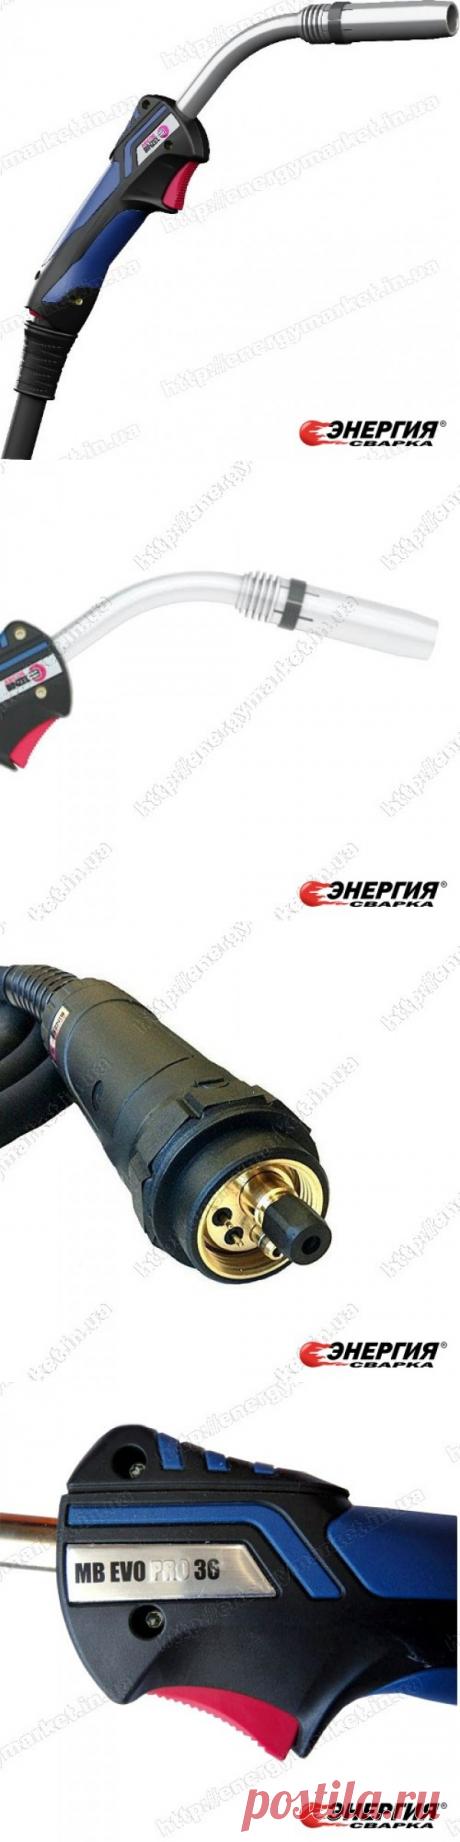 014.0531.1 Сварочная горелка Abicor Binzel MВ EVO PRO 36  (KZ-2)  5,00 м      купить цена Украине